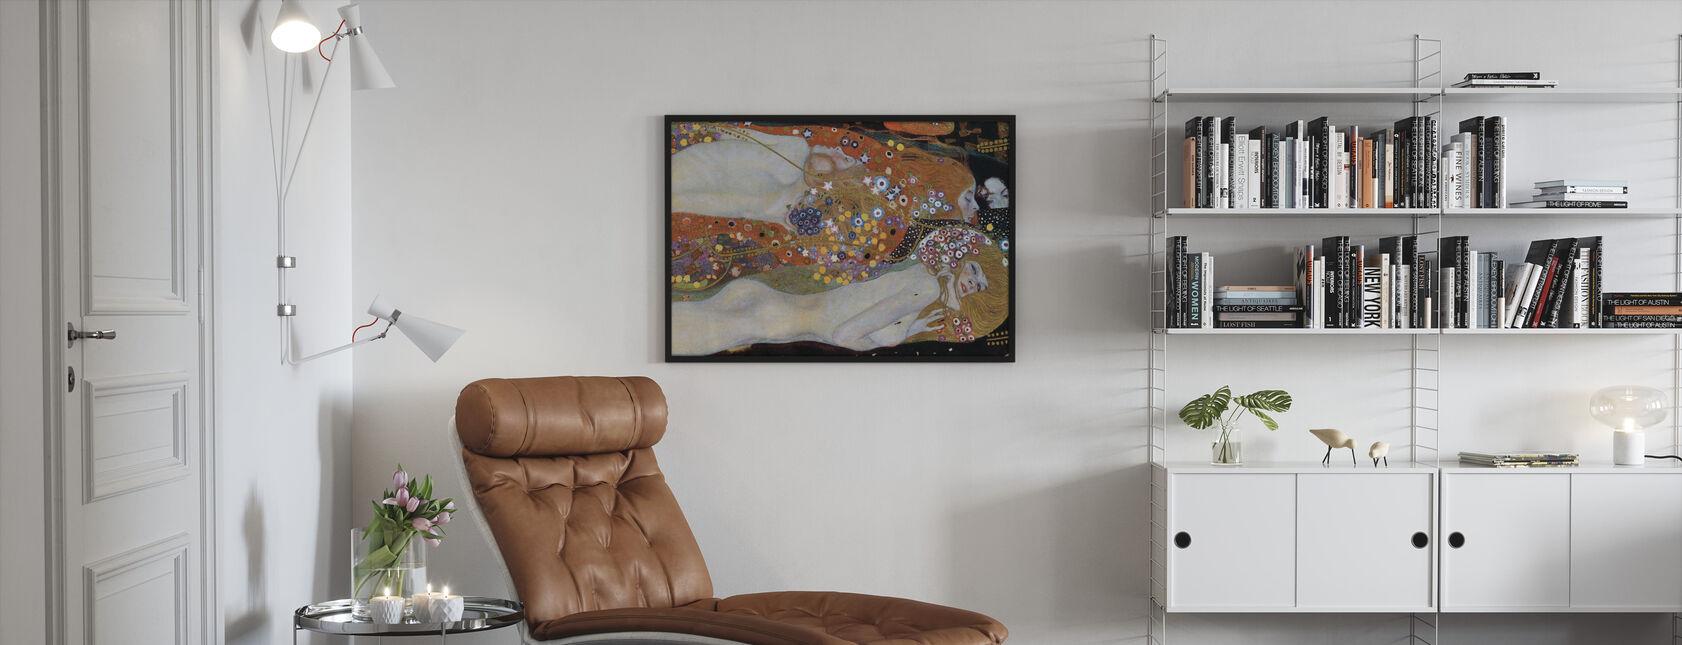 Waterslangen - Gustav Klimt - Ingelijste print - Woonkamer